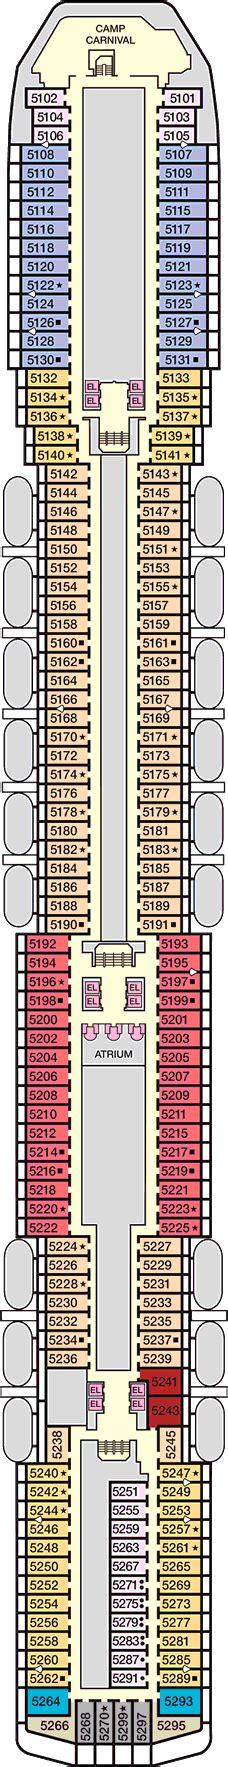 carnival legend floor plan carnival legend deck 5 upper deck cruise critic